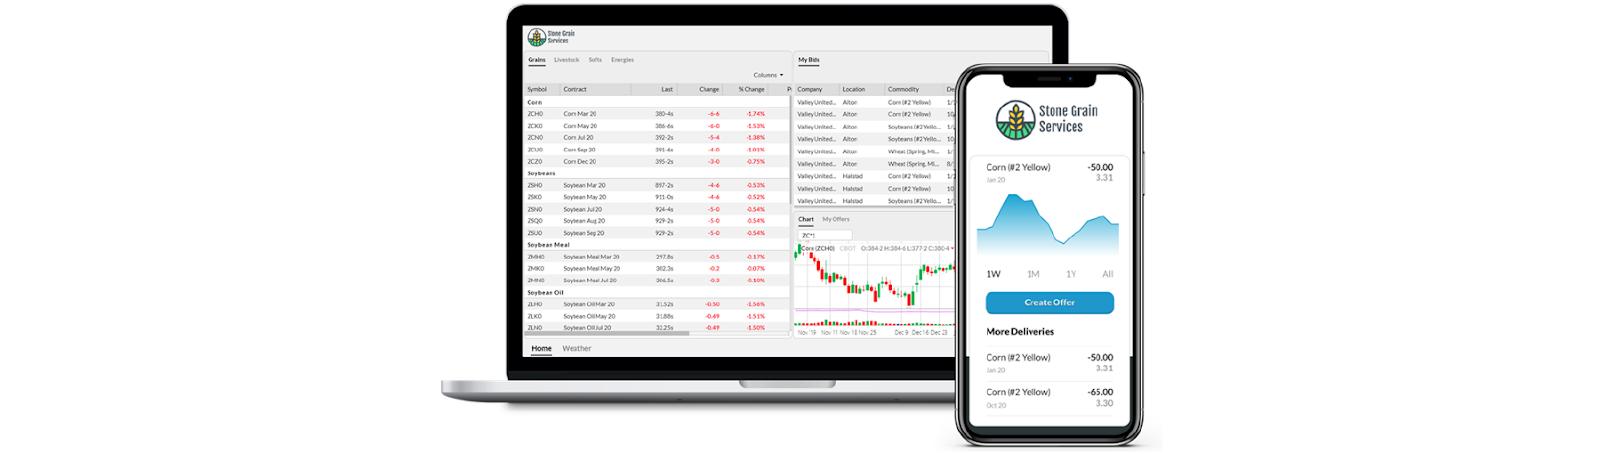 Grain Marketplace Apps